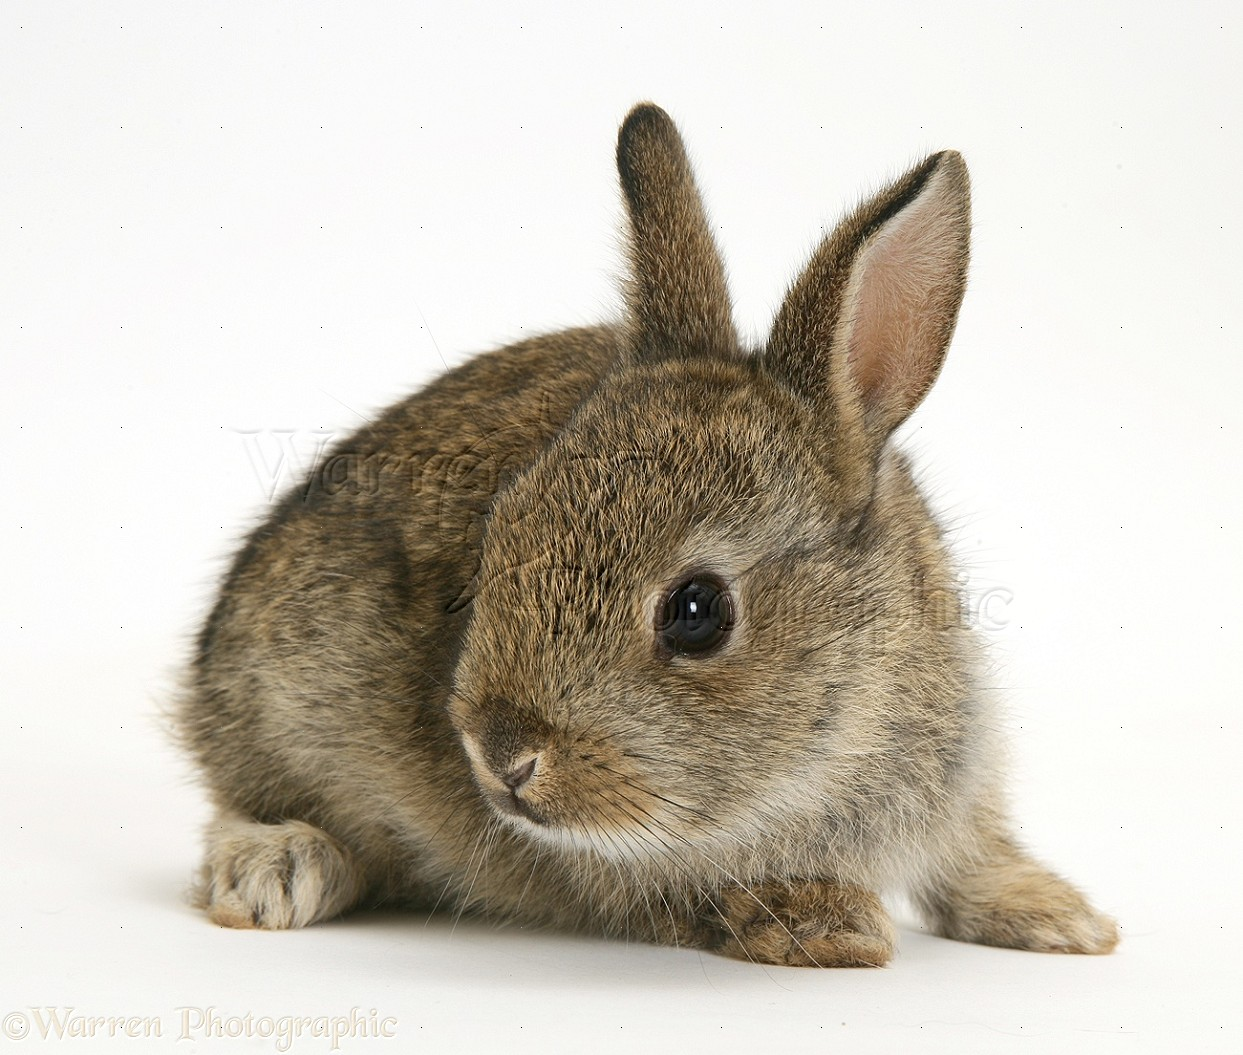 baby european rabbit photo wp17586